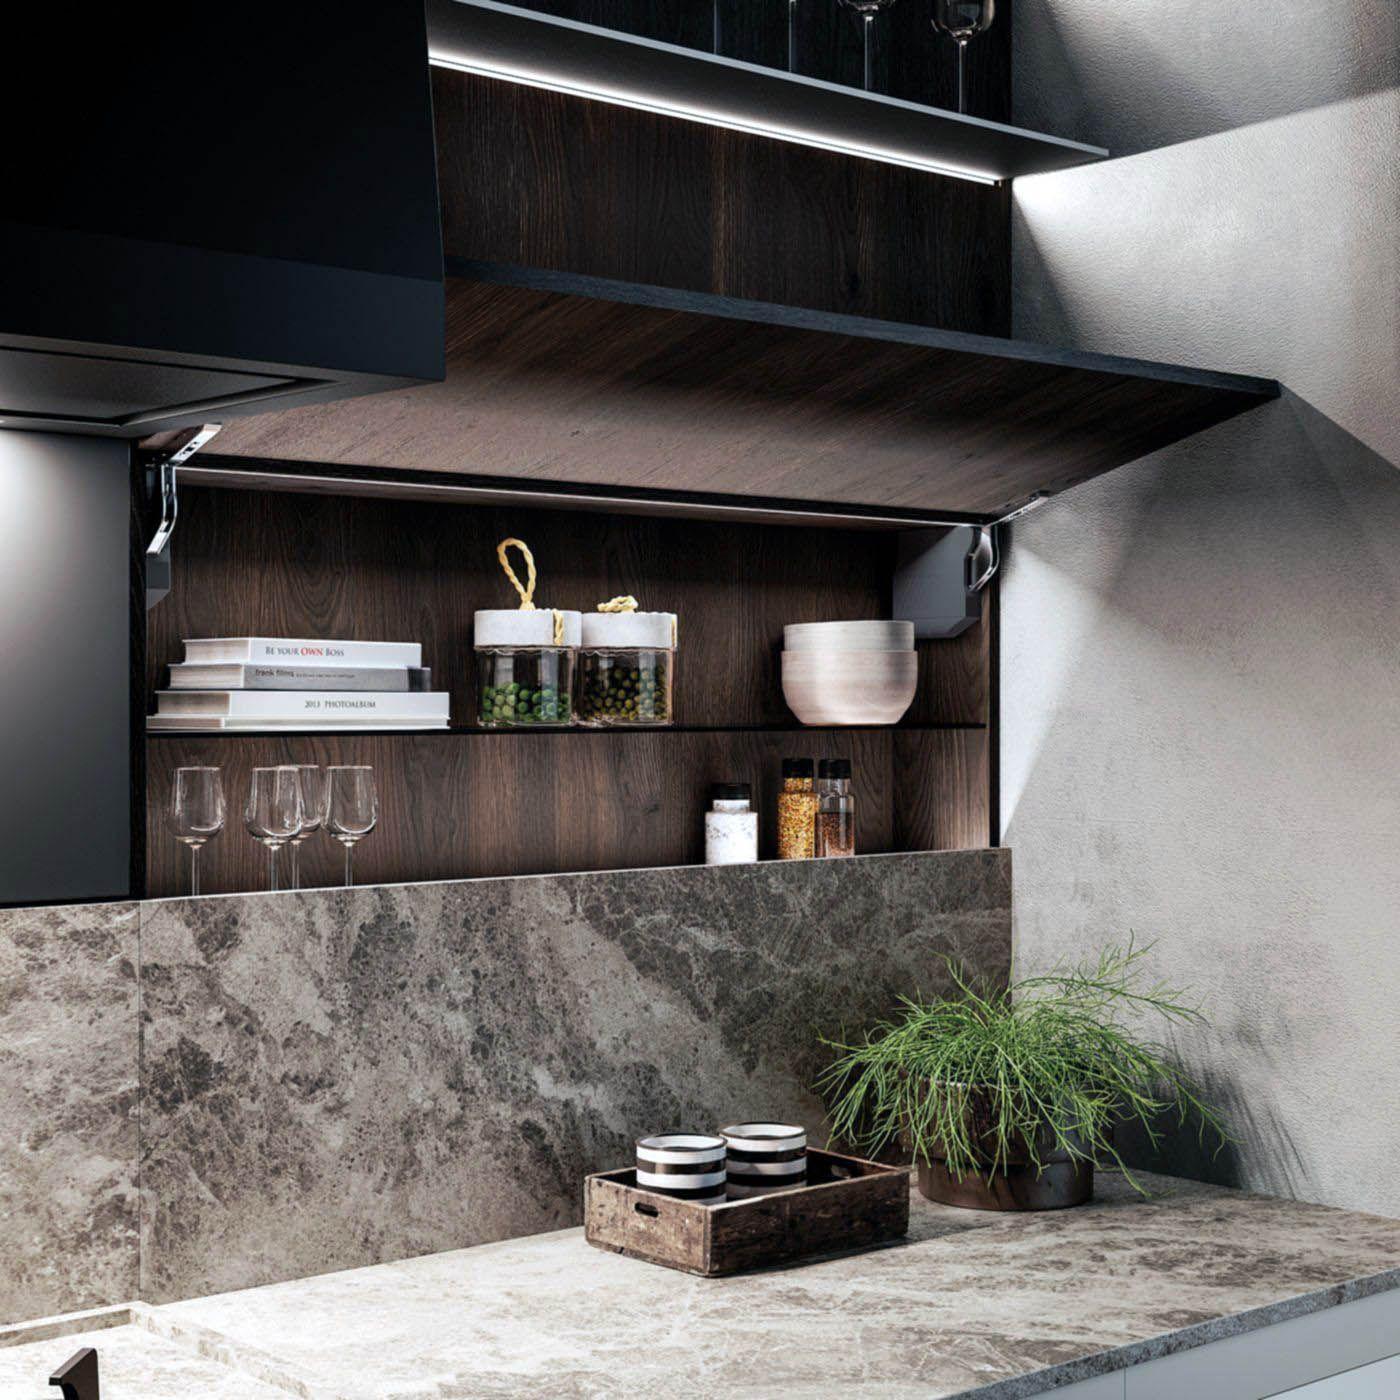 Trendy Alice S Luxury Kitchen Escape Walkthrough To Inspire You Home Decor Modern Interiors Design